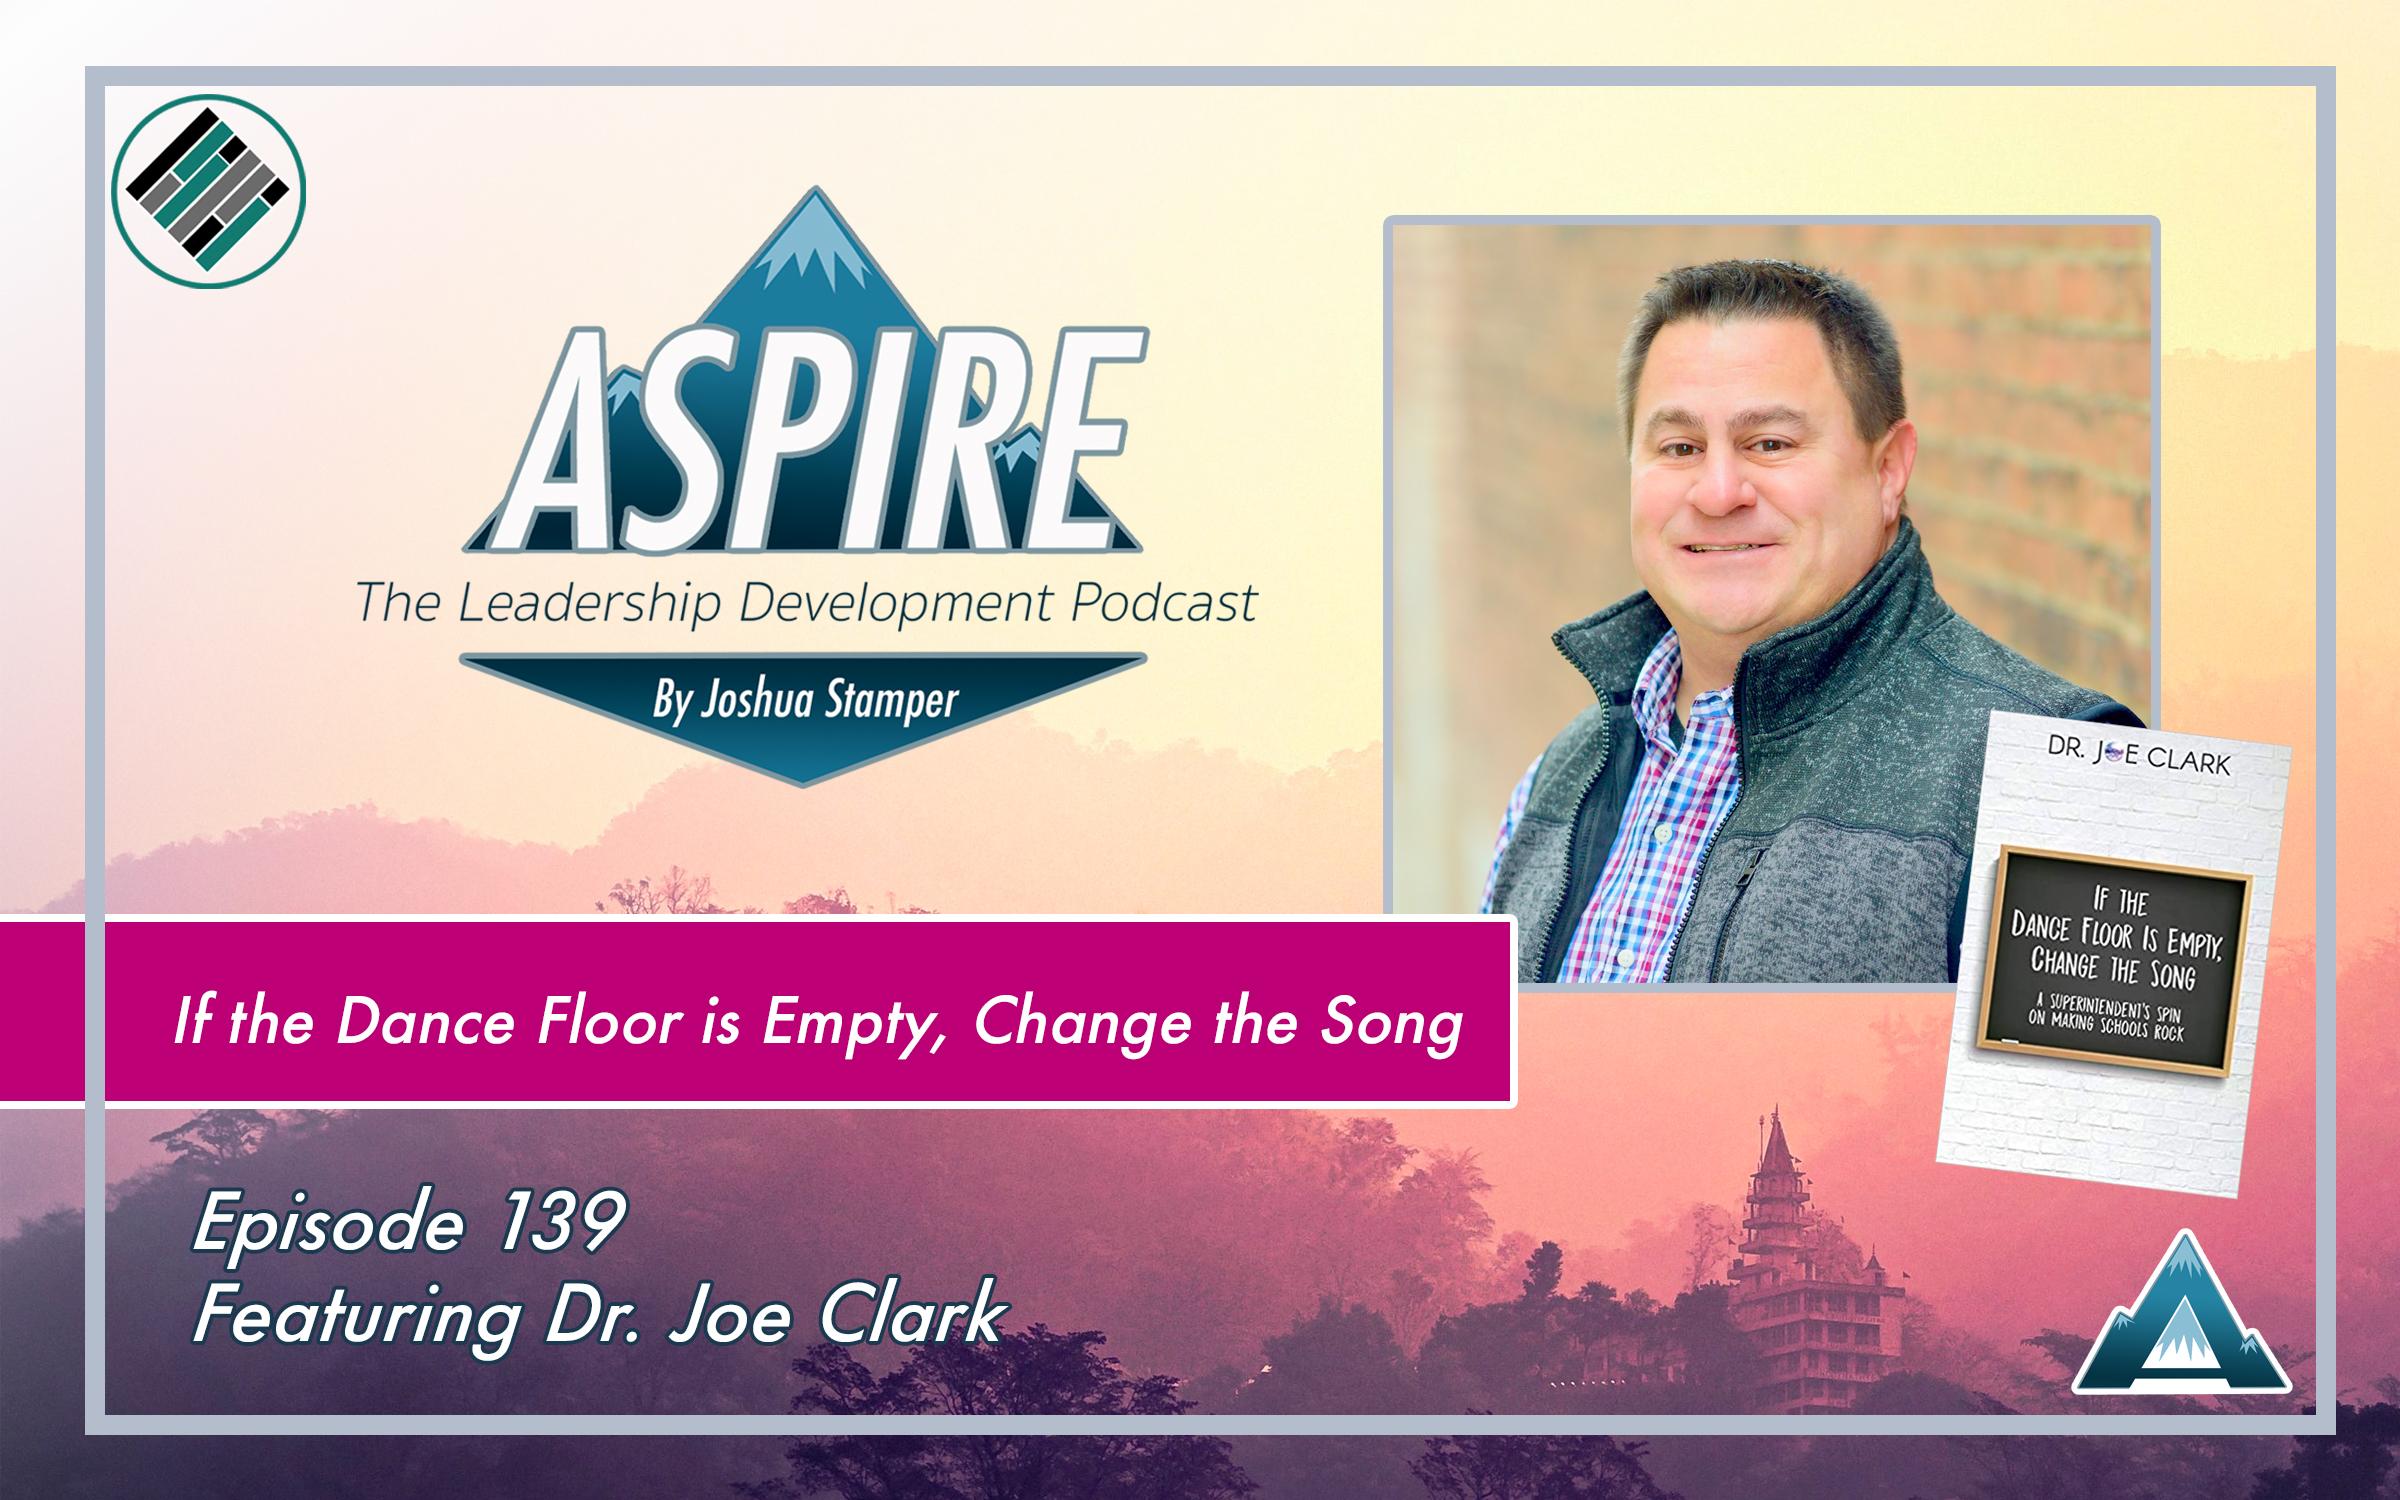 Joshua Stamper, Dr. Joe Clark, Aspire: The Leadership Development Podcast, #AspireLead